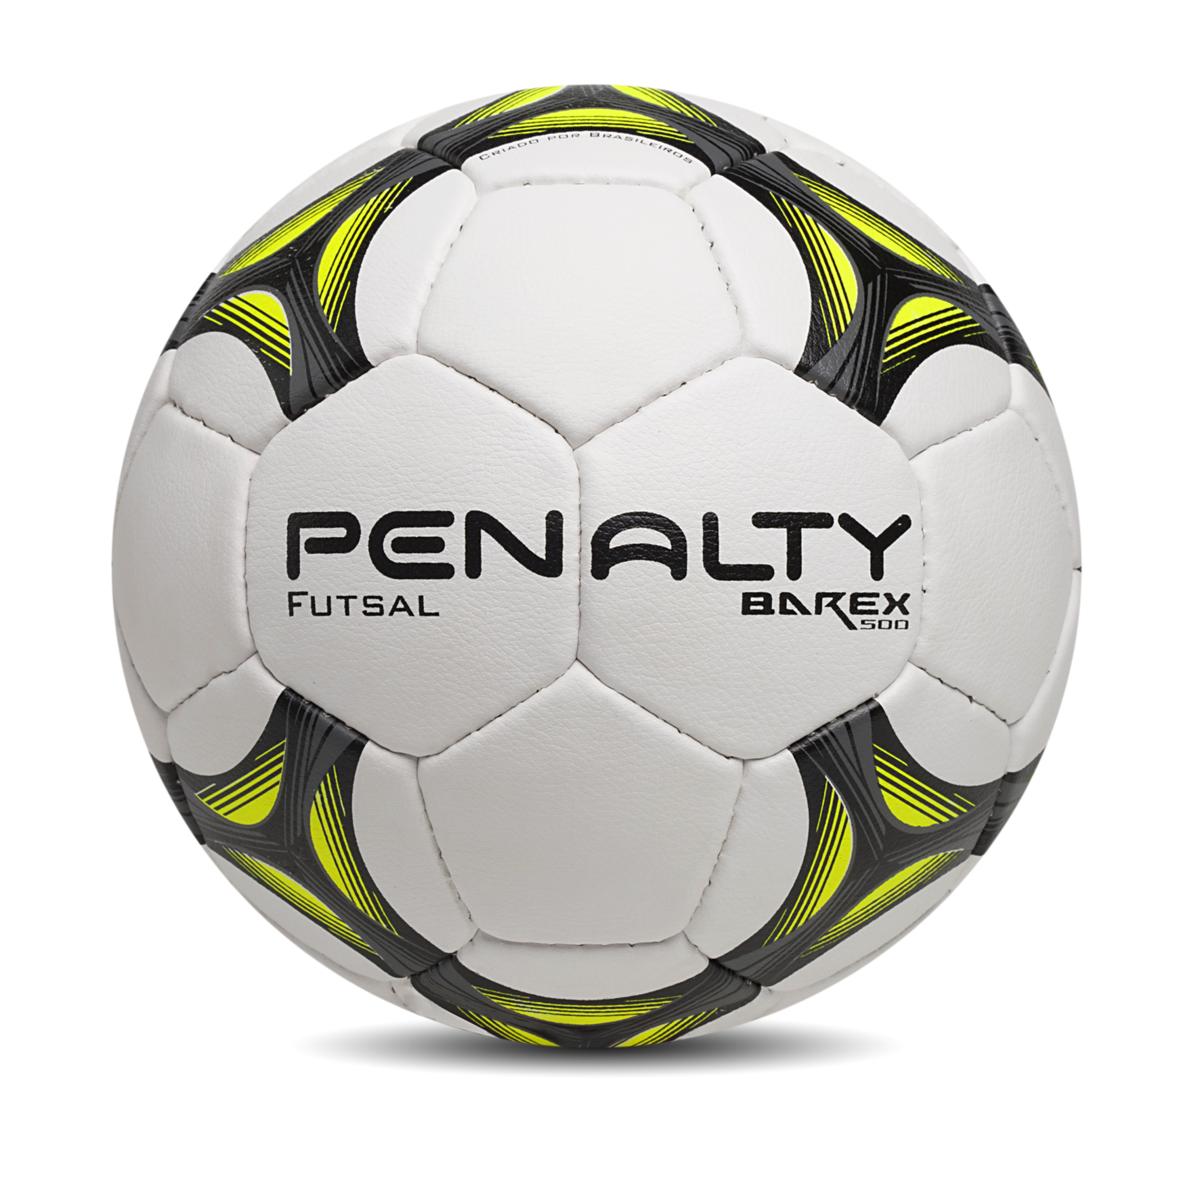 b9ae60cc32 Bola Futsal Penalty Barex 500 – 510836 – Branco e Chumbo